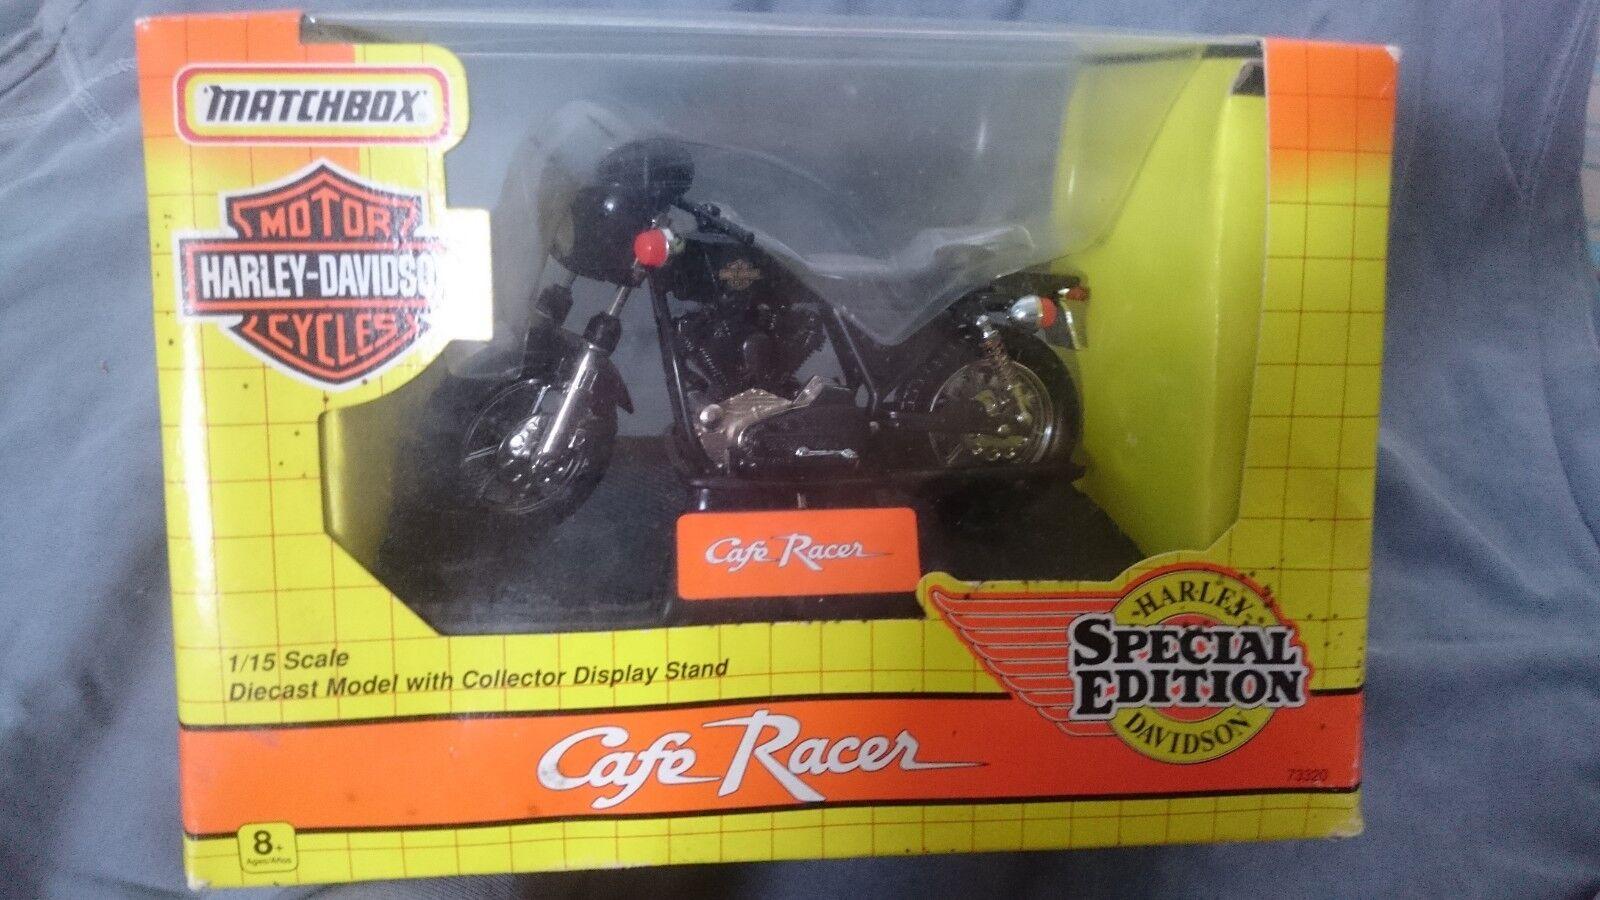 MATCHBOX HARLEY DAVIDSON CAFE RACER SPECIAL EDITION 73320 1 15 SCALE